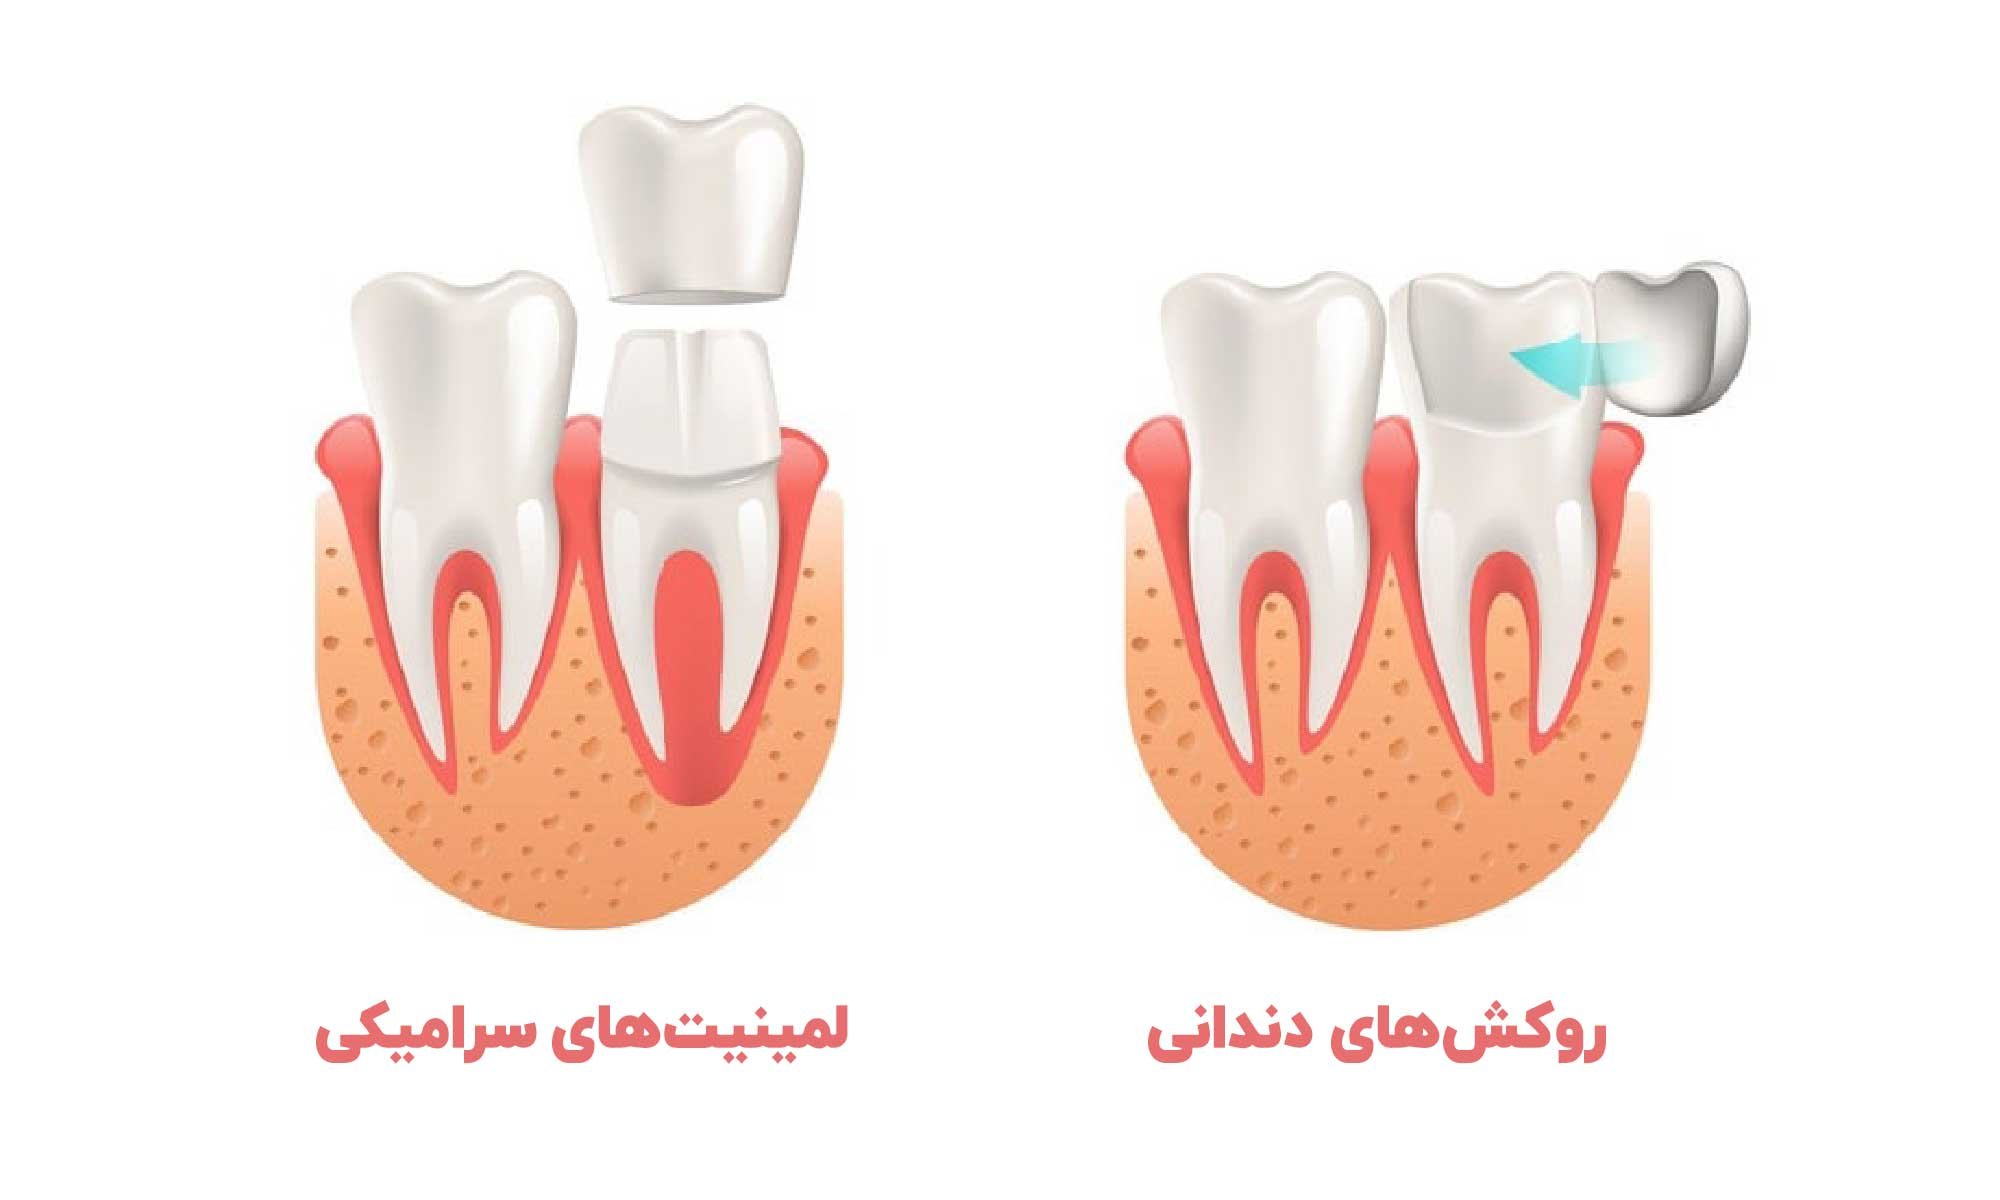 تفاوت روکش دندانی و لمینت سرامیکی